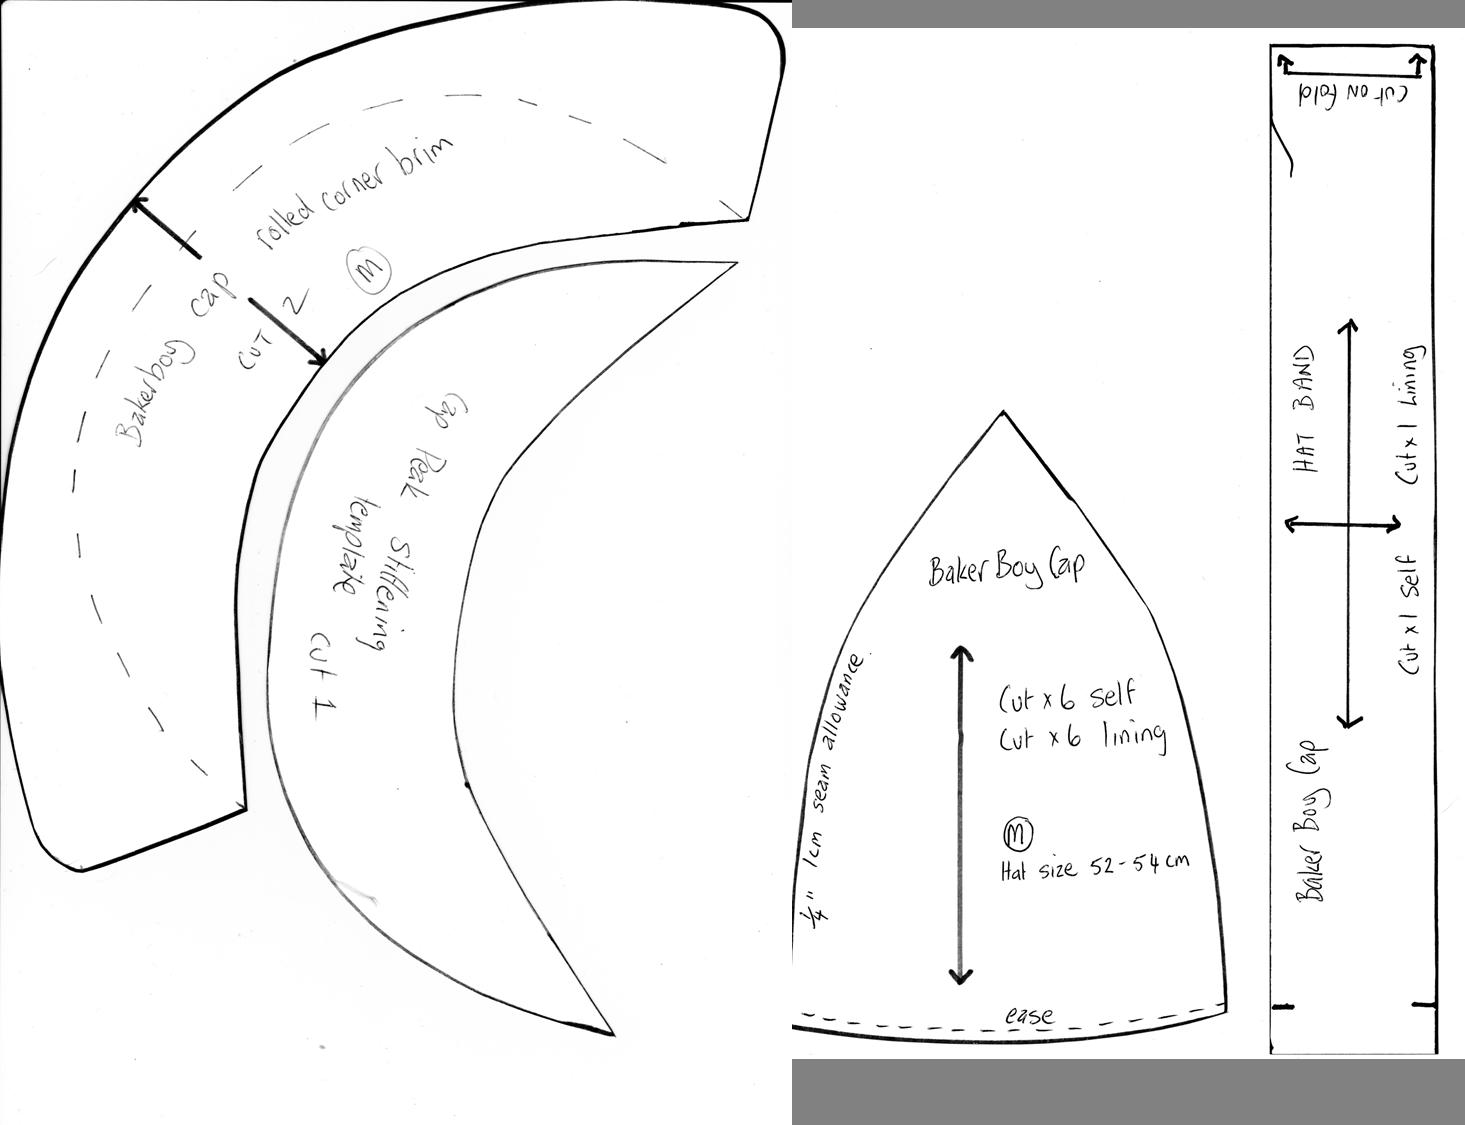 baker boy hat pattern - Google Search | SEWING PATTERNS 2 | Pinterest